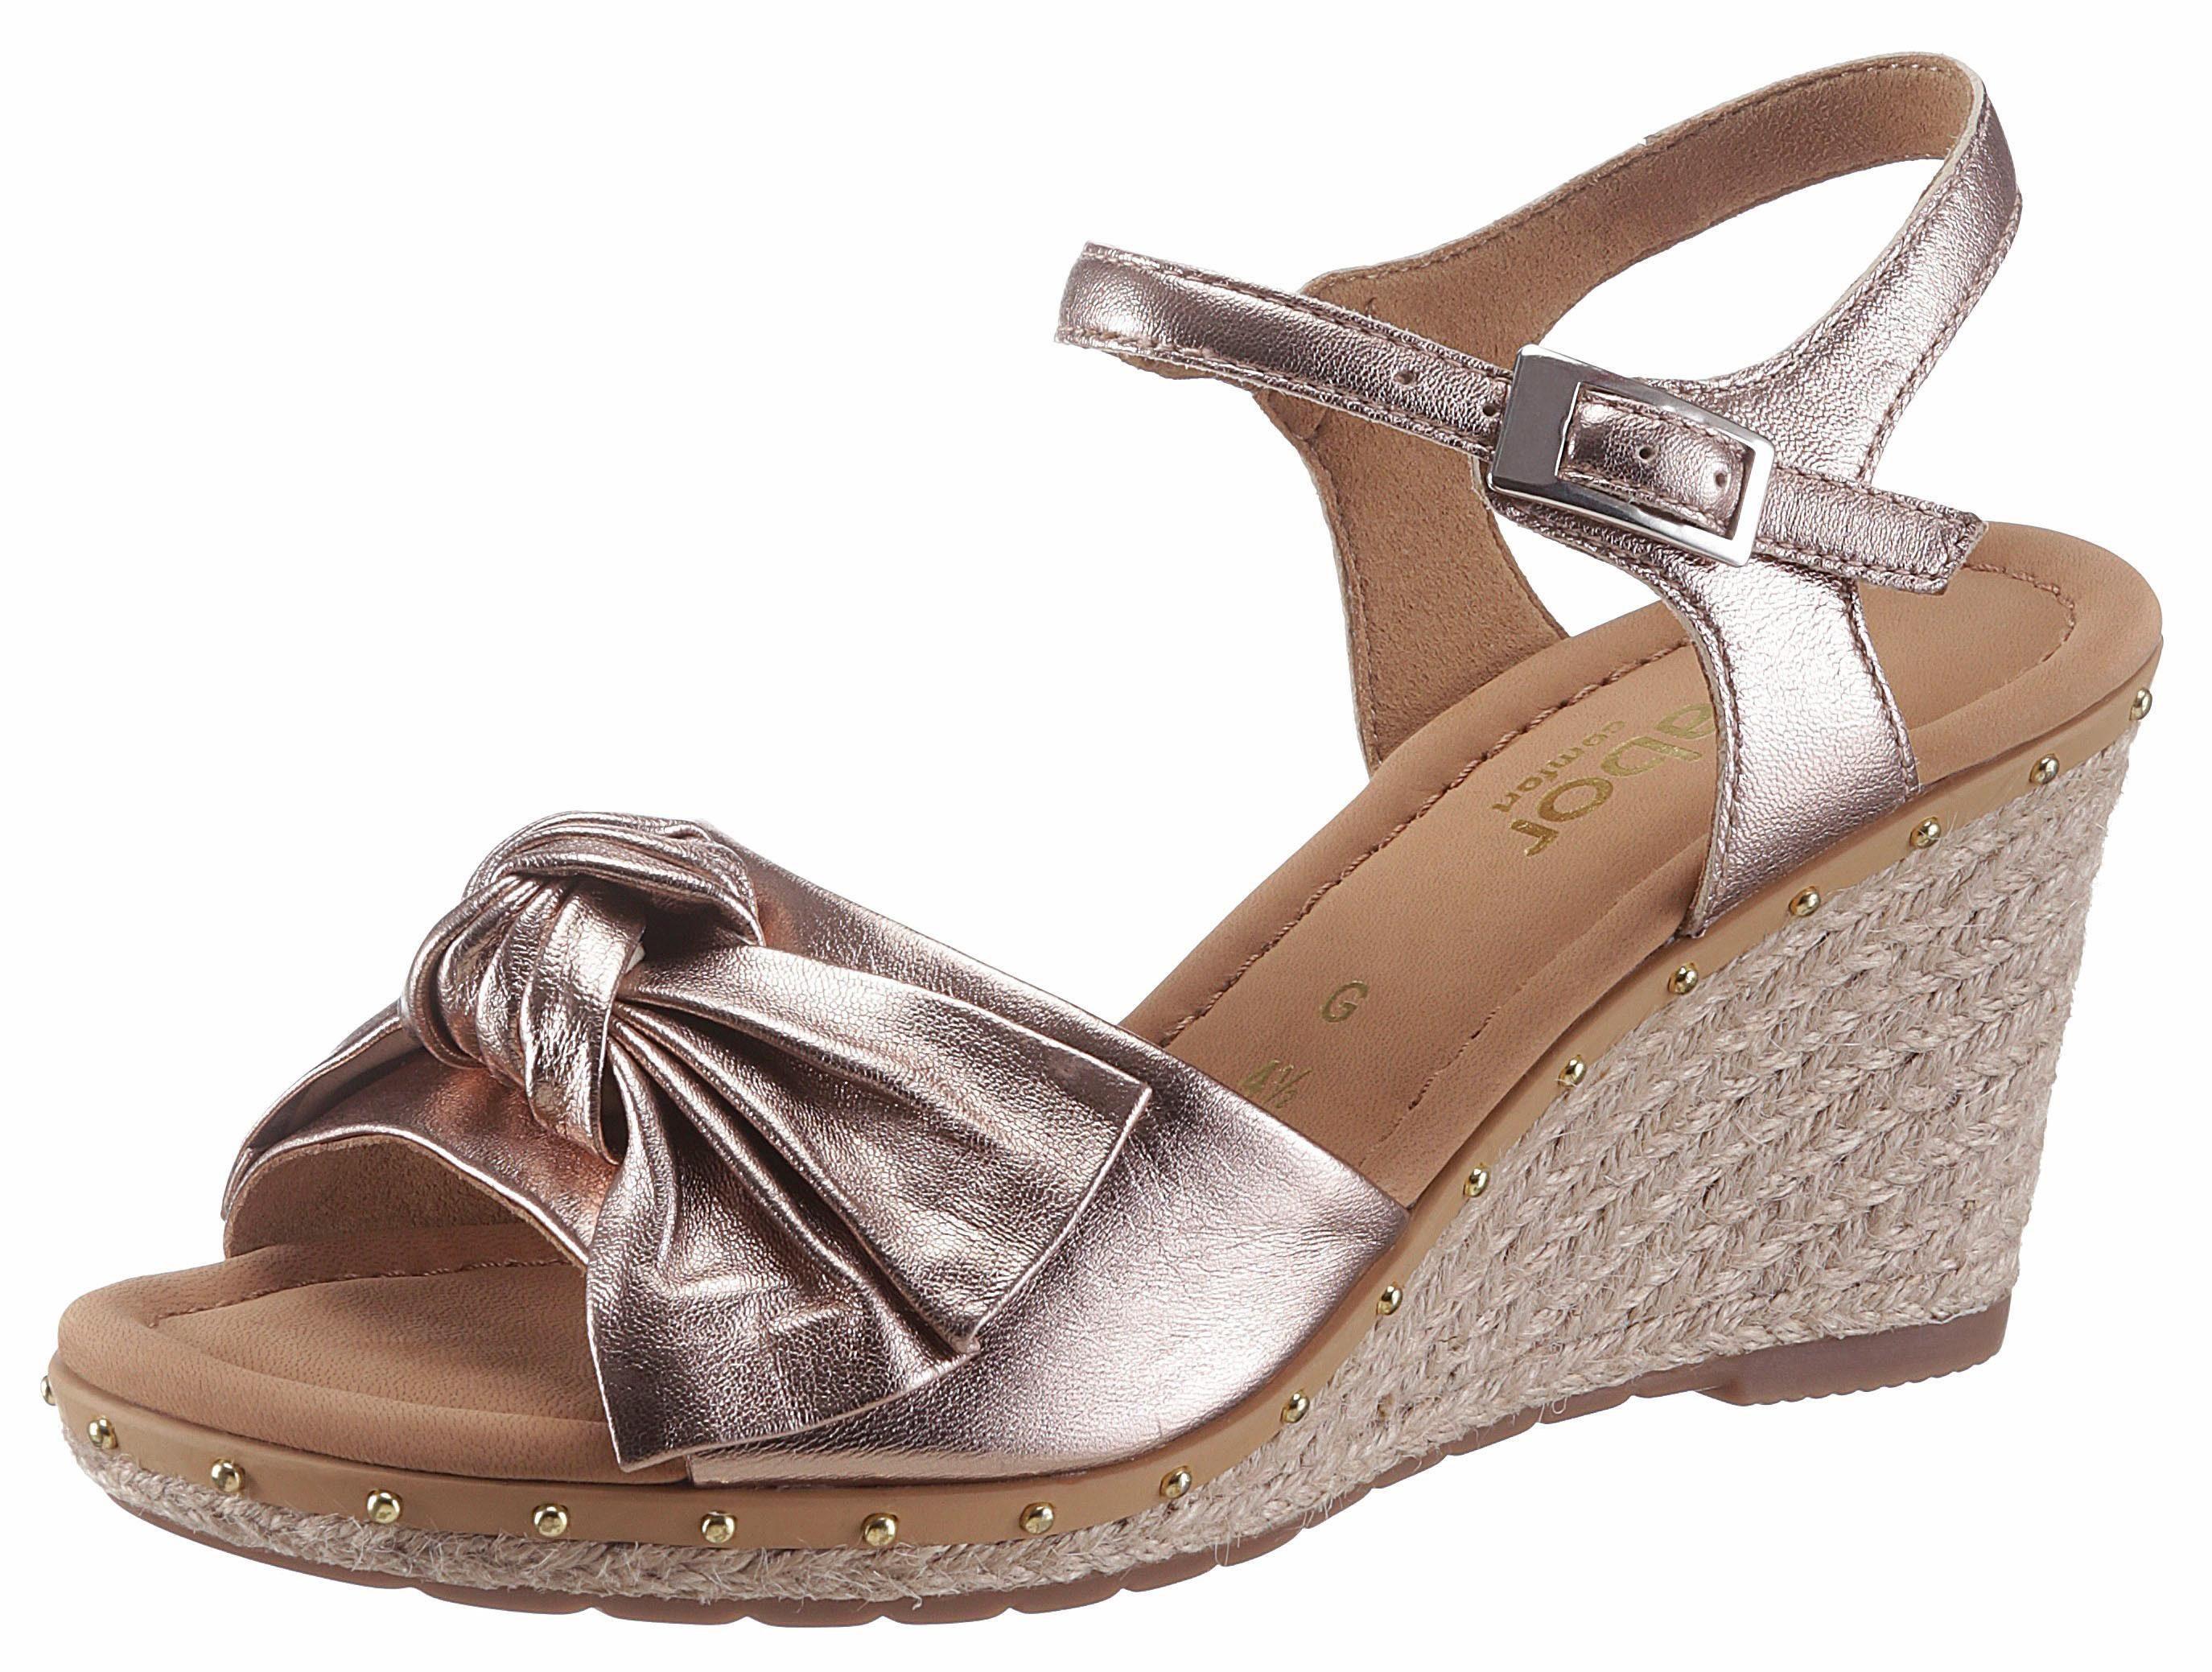 Gabor Sandalette, im trendigen Metallic Look mit Nieten besetz online kaufen  roségoldfarben